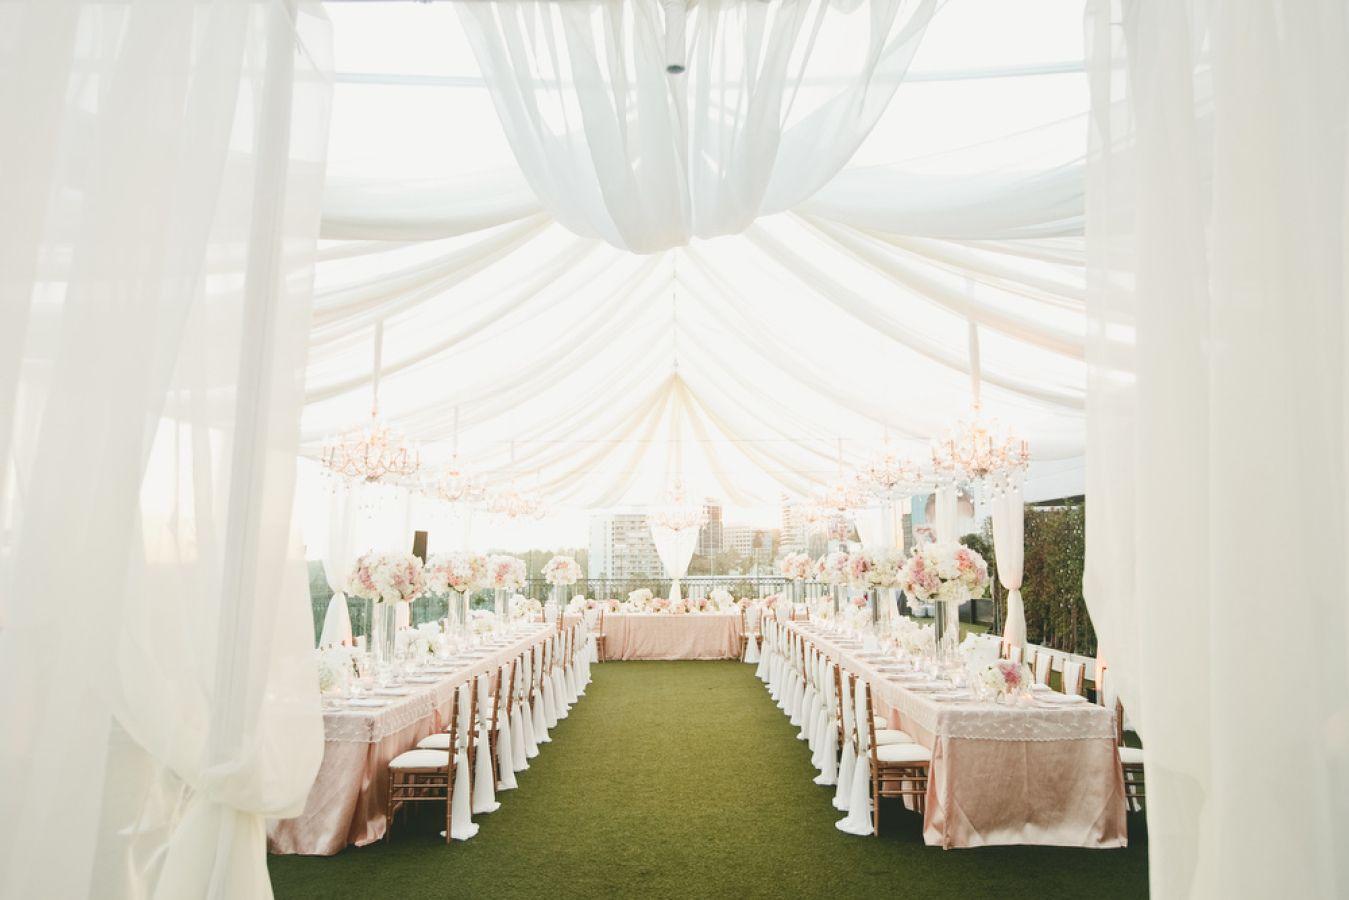 Beutiful California White Tent